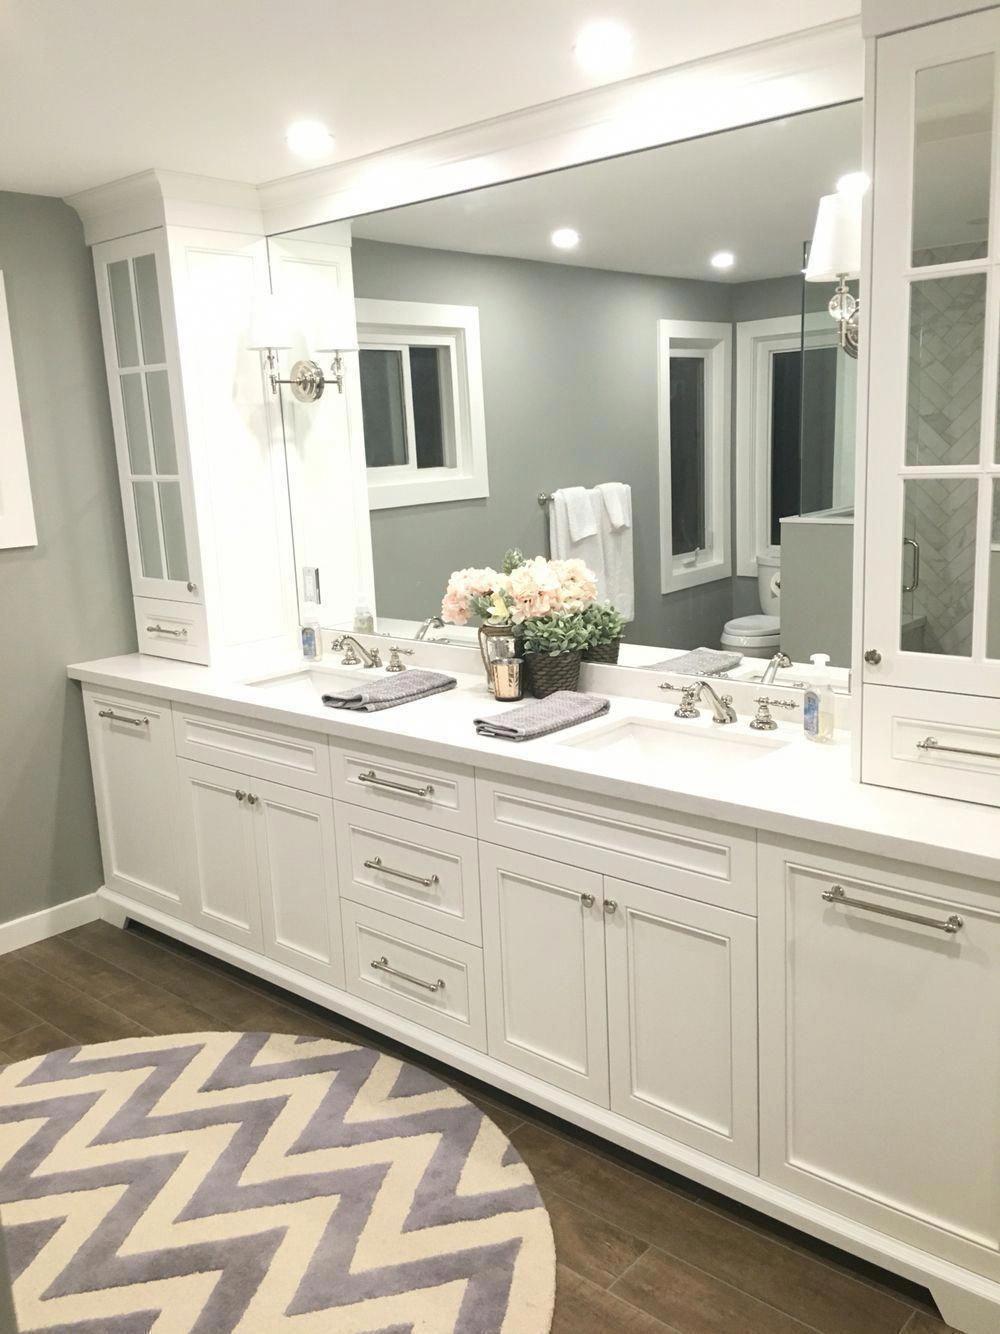 Family Rules Rustic Wood Waterproof Fabric Bathroom Shower Curtain